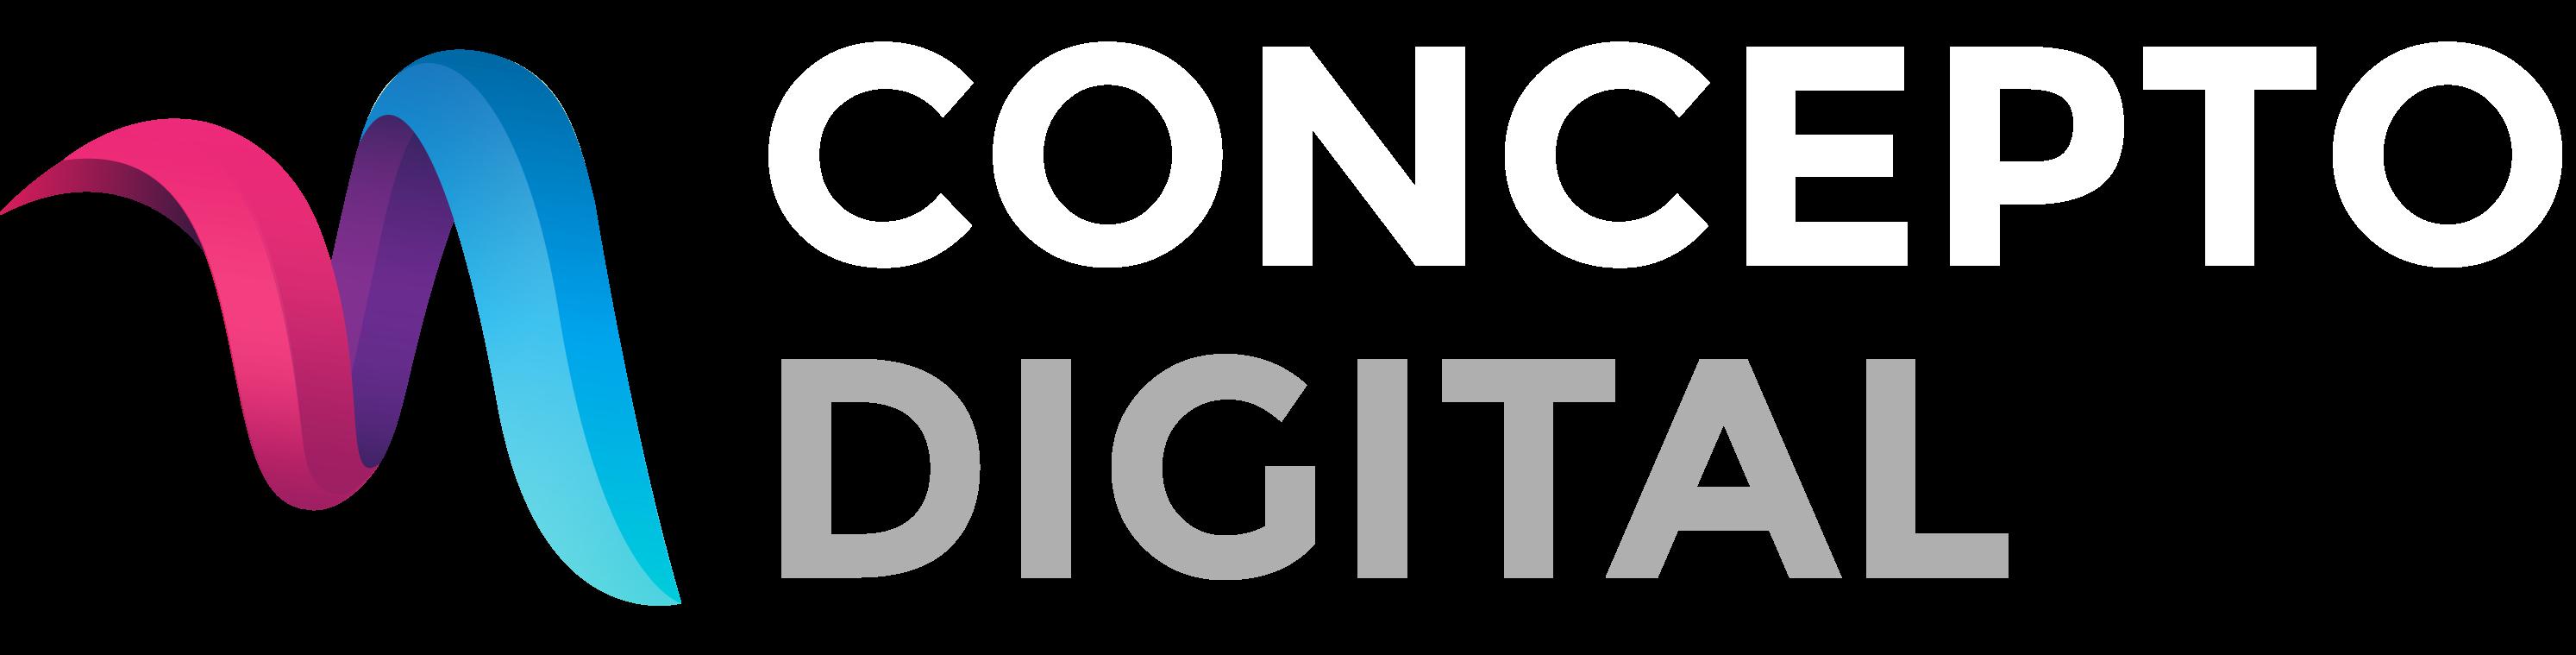 Concepto Digital